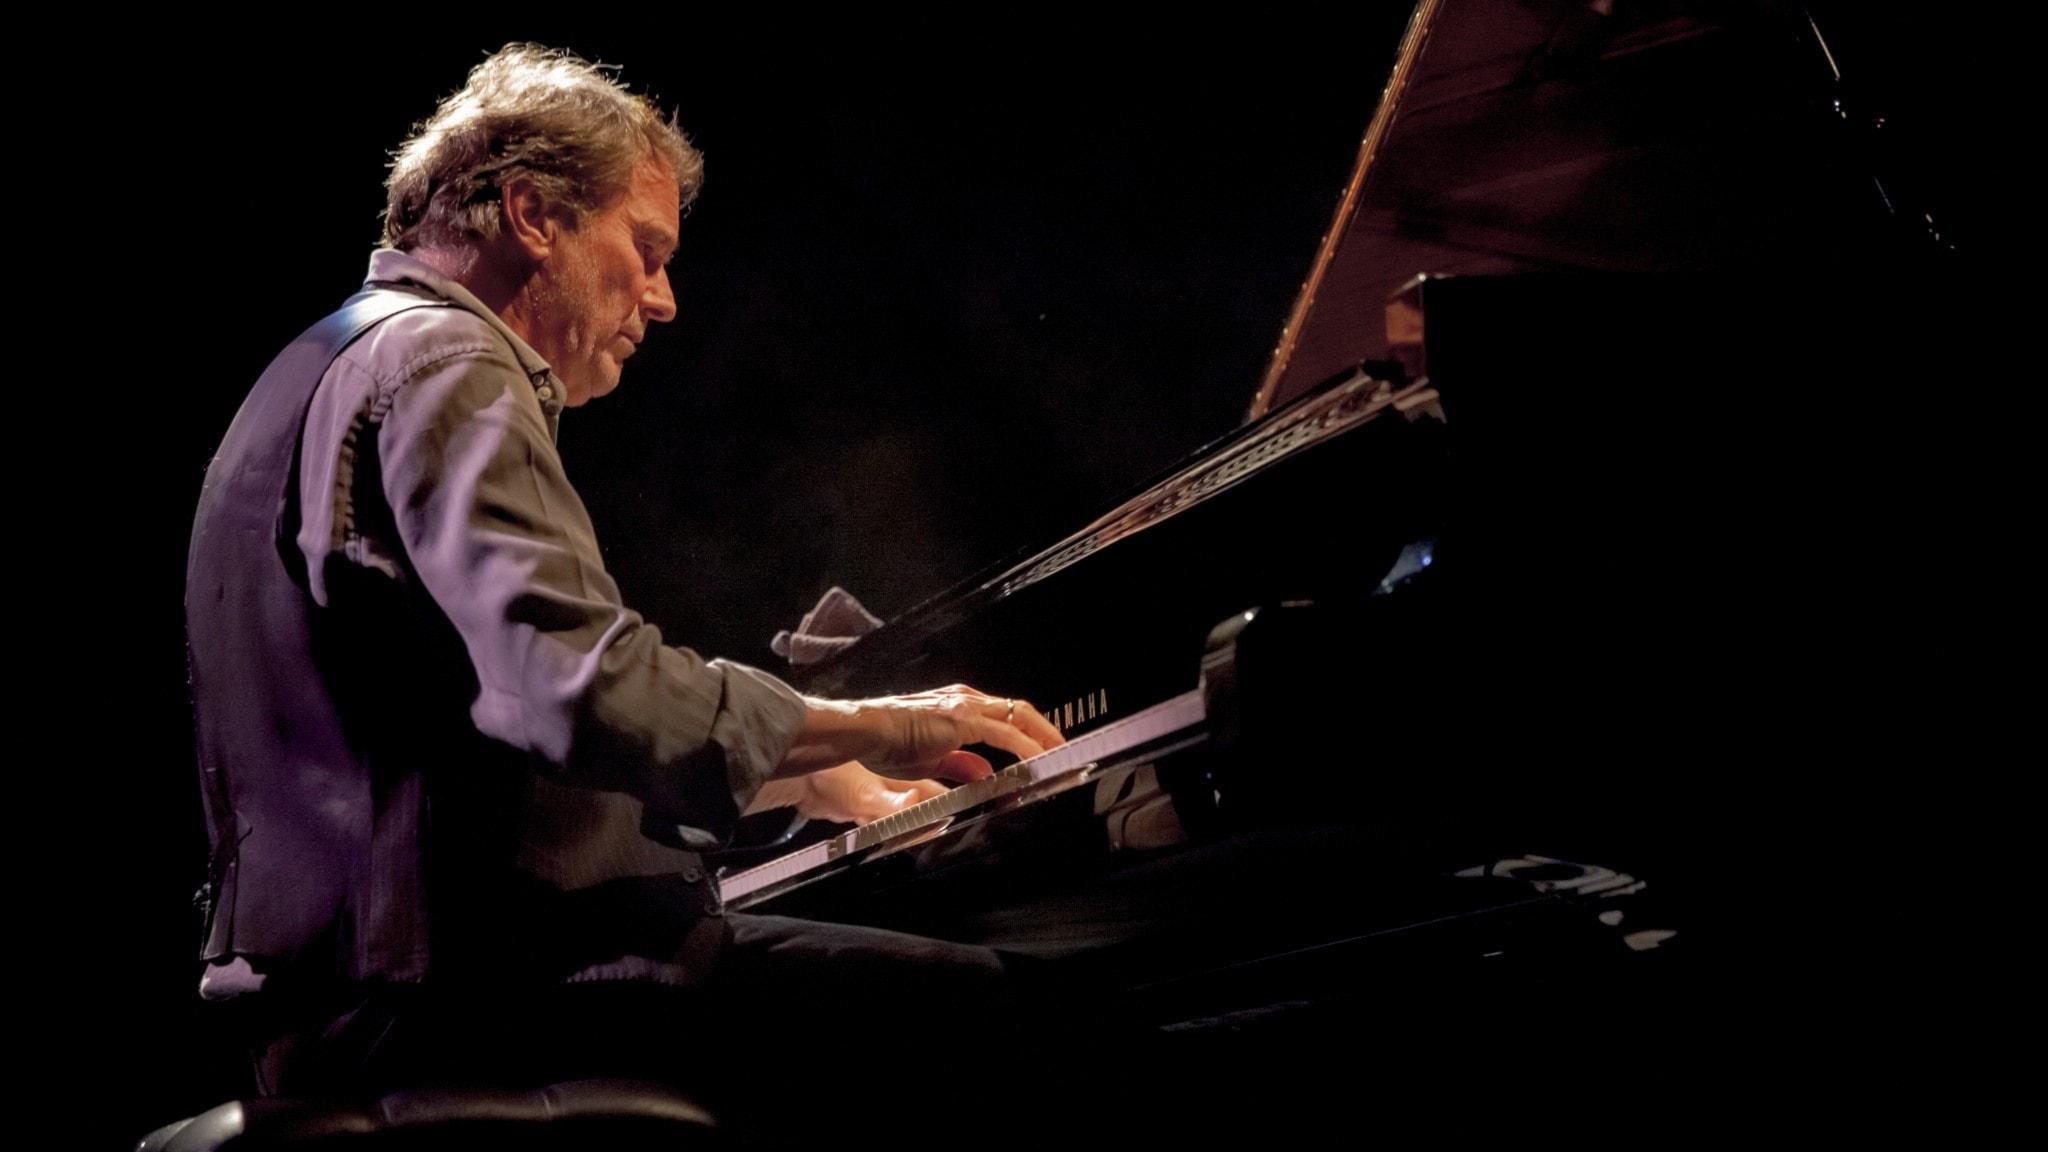 KONSERT: Norrbotten Big Band hyllar pianisten Bobo Stenson